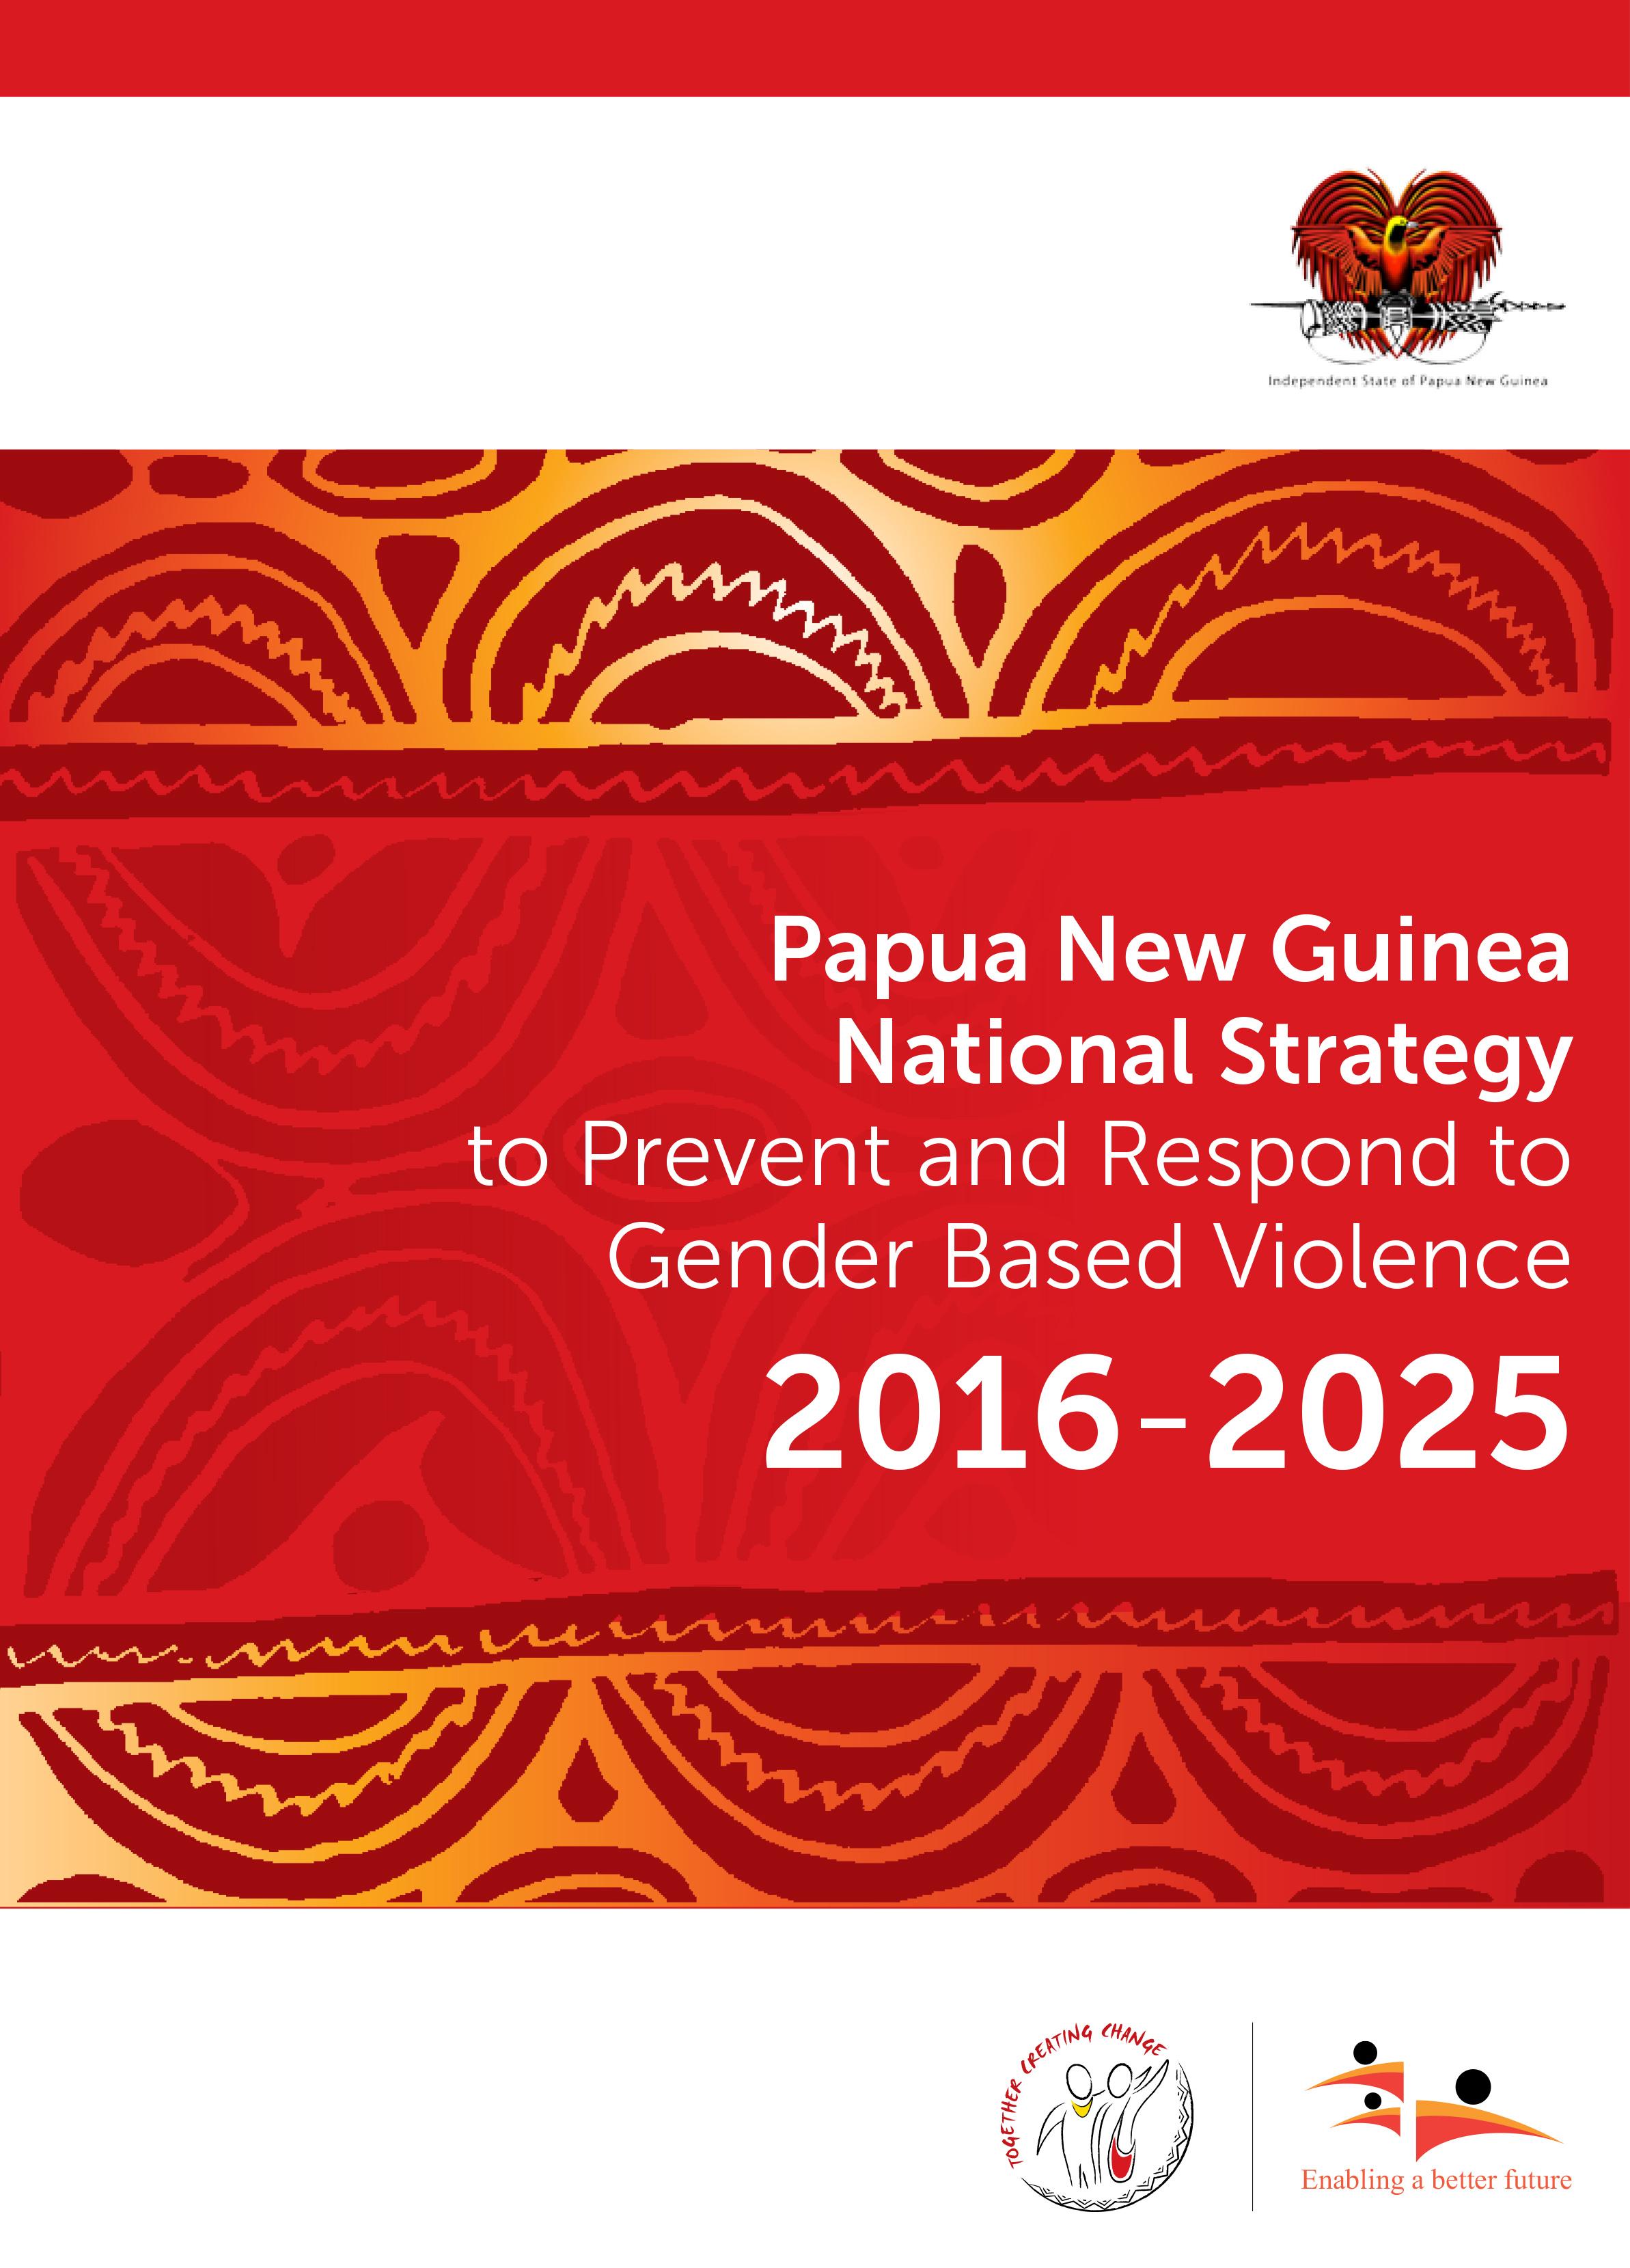 PNG GBV_Strategy 2016-2025_150816_FINAL-1.jpg